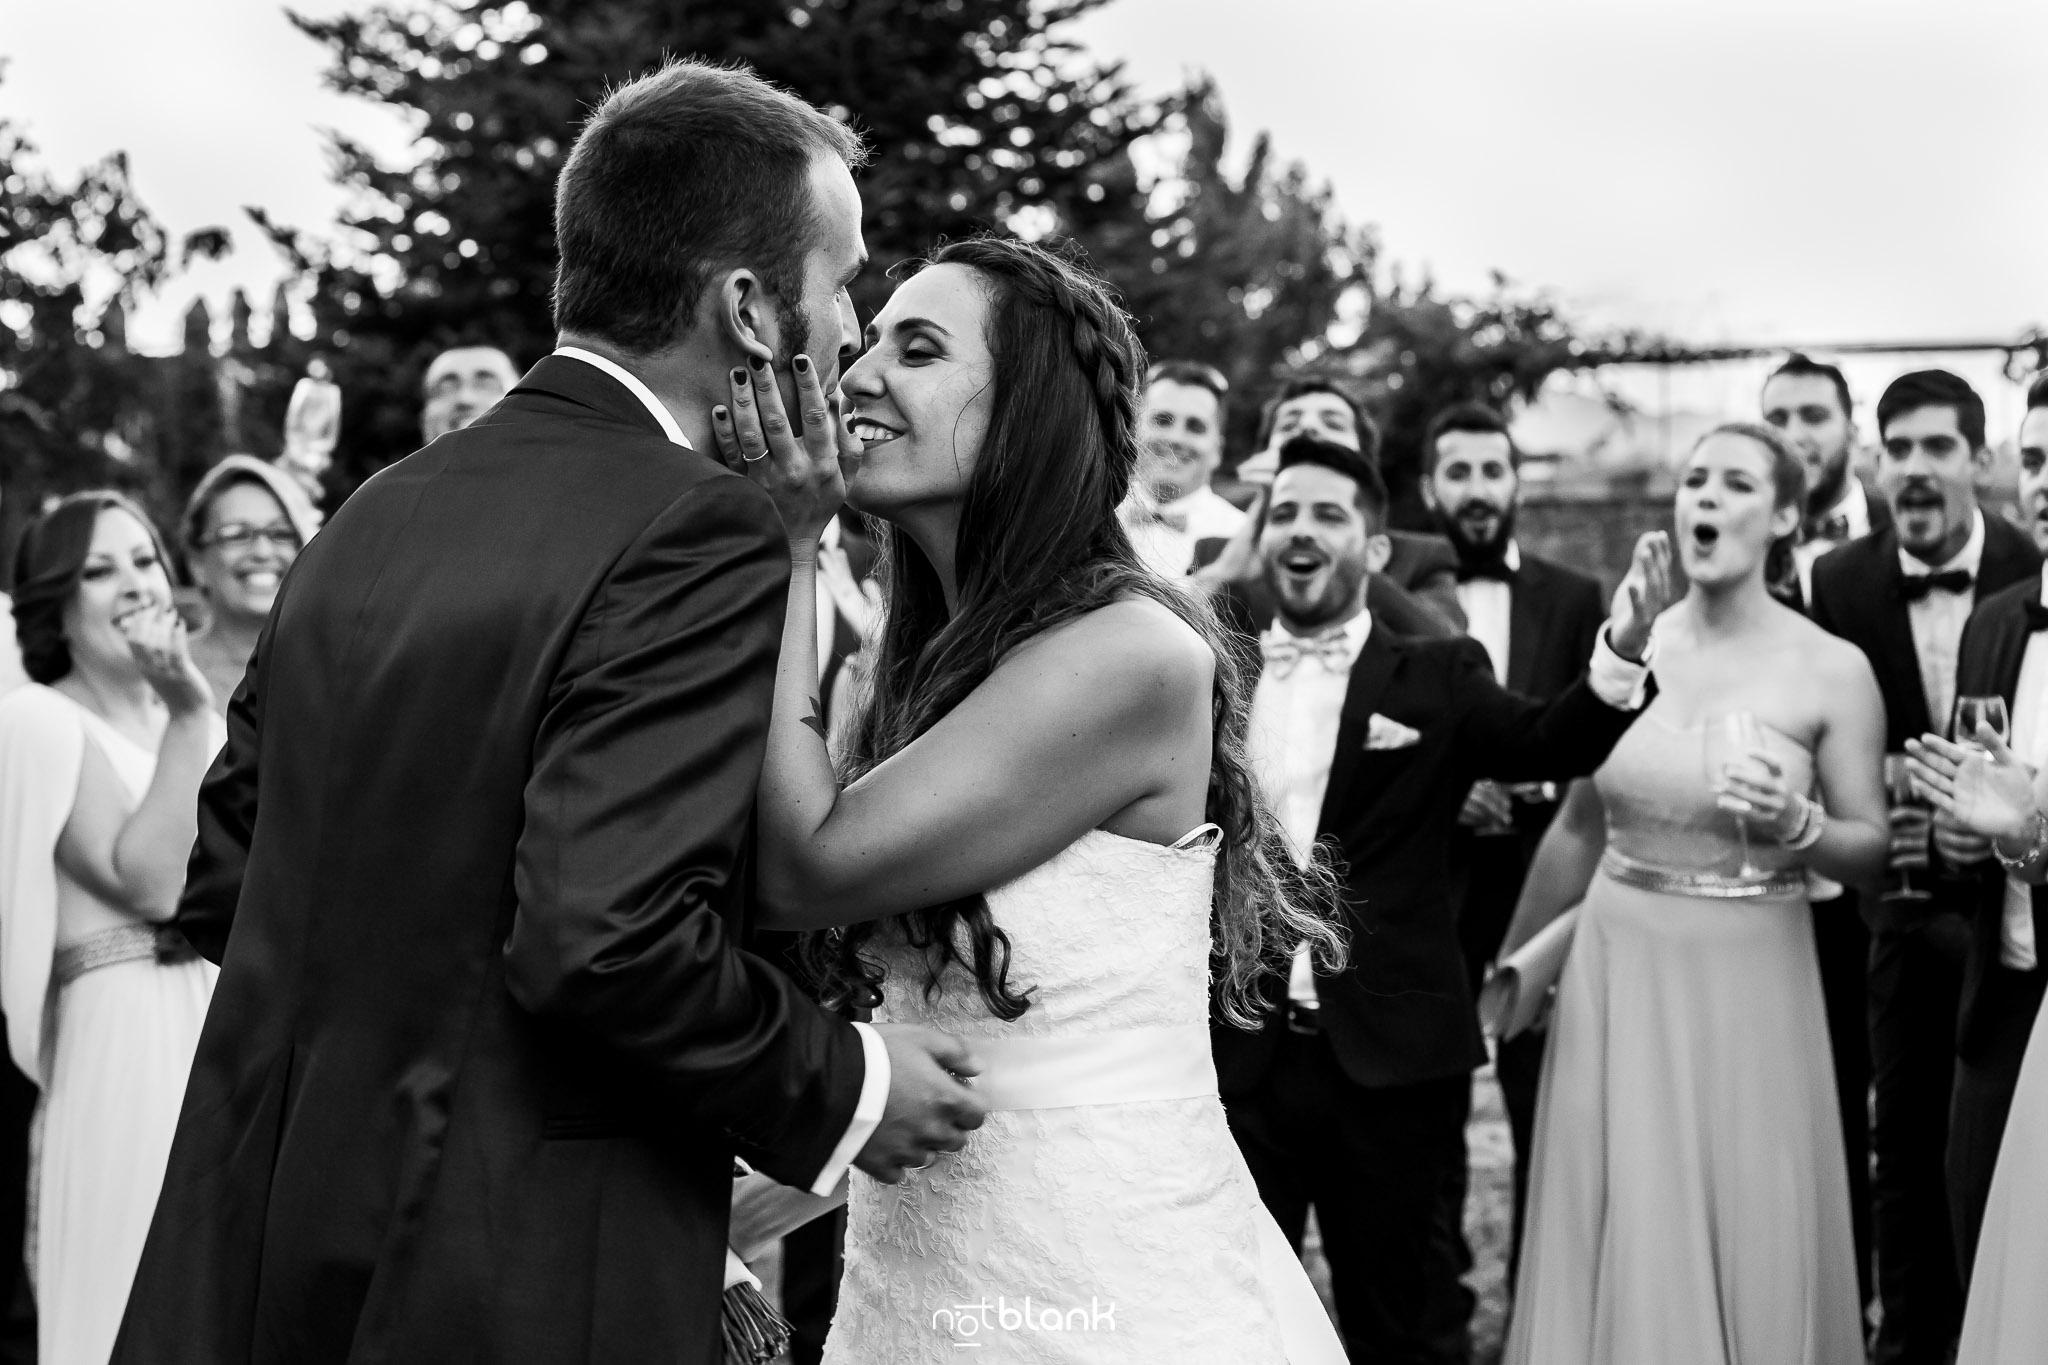 Boda-Lorena-Pablo-Vilanova-De-Cerveira-Novia-Beso-Invitados-Fotógrafo de boda